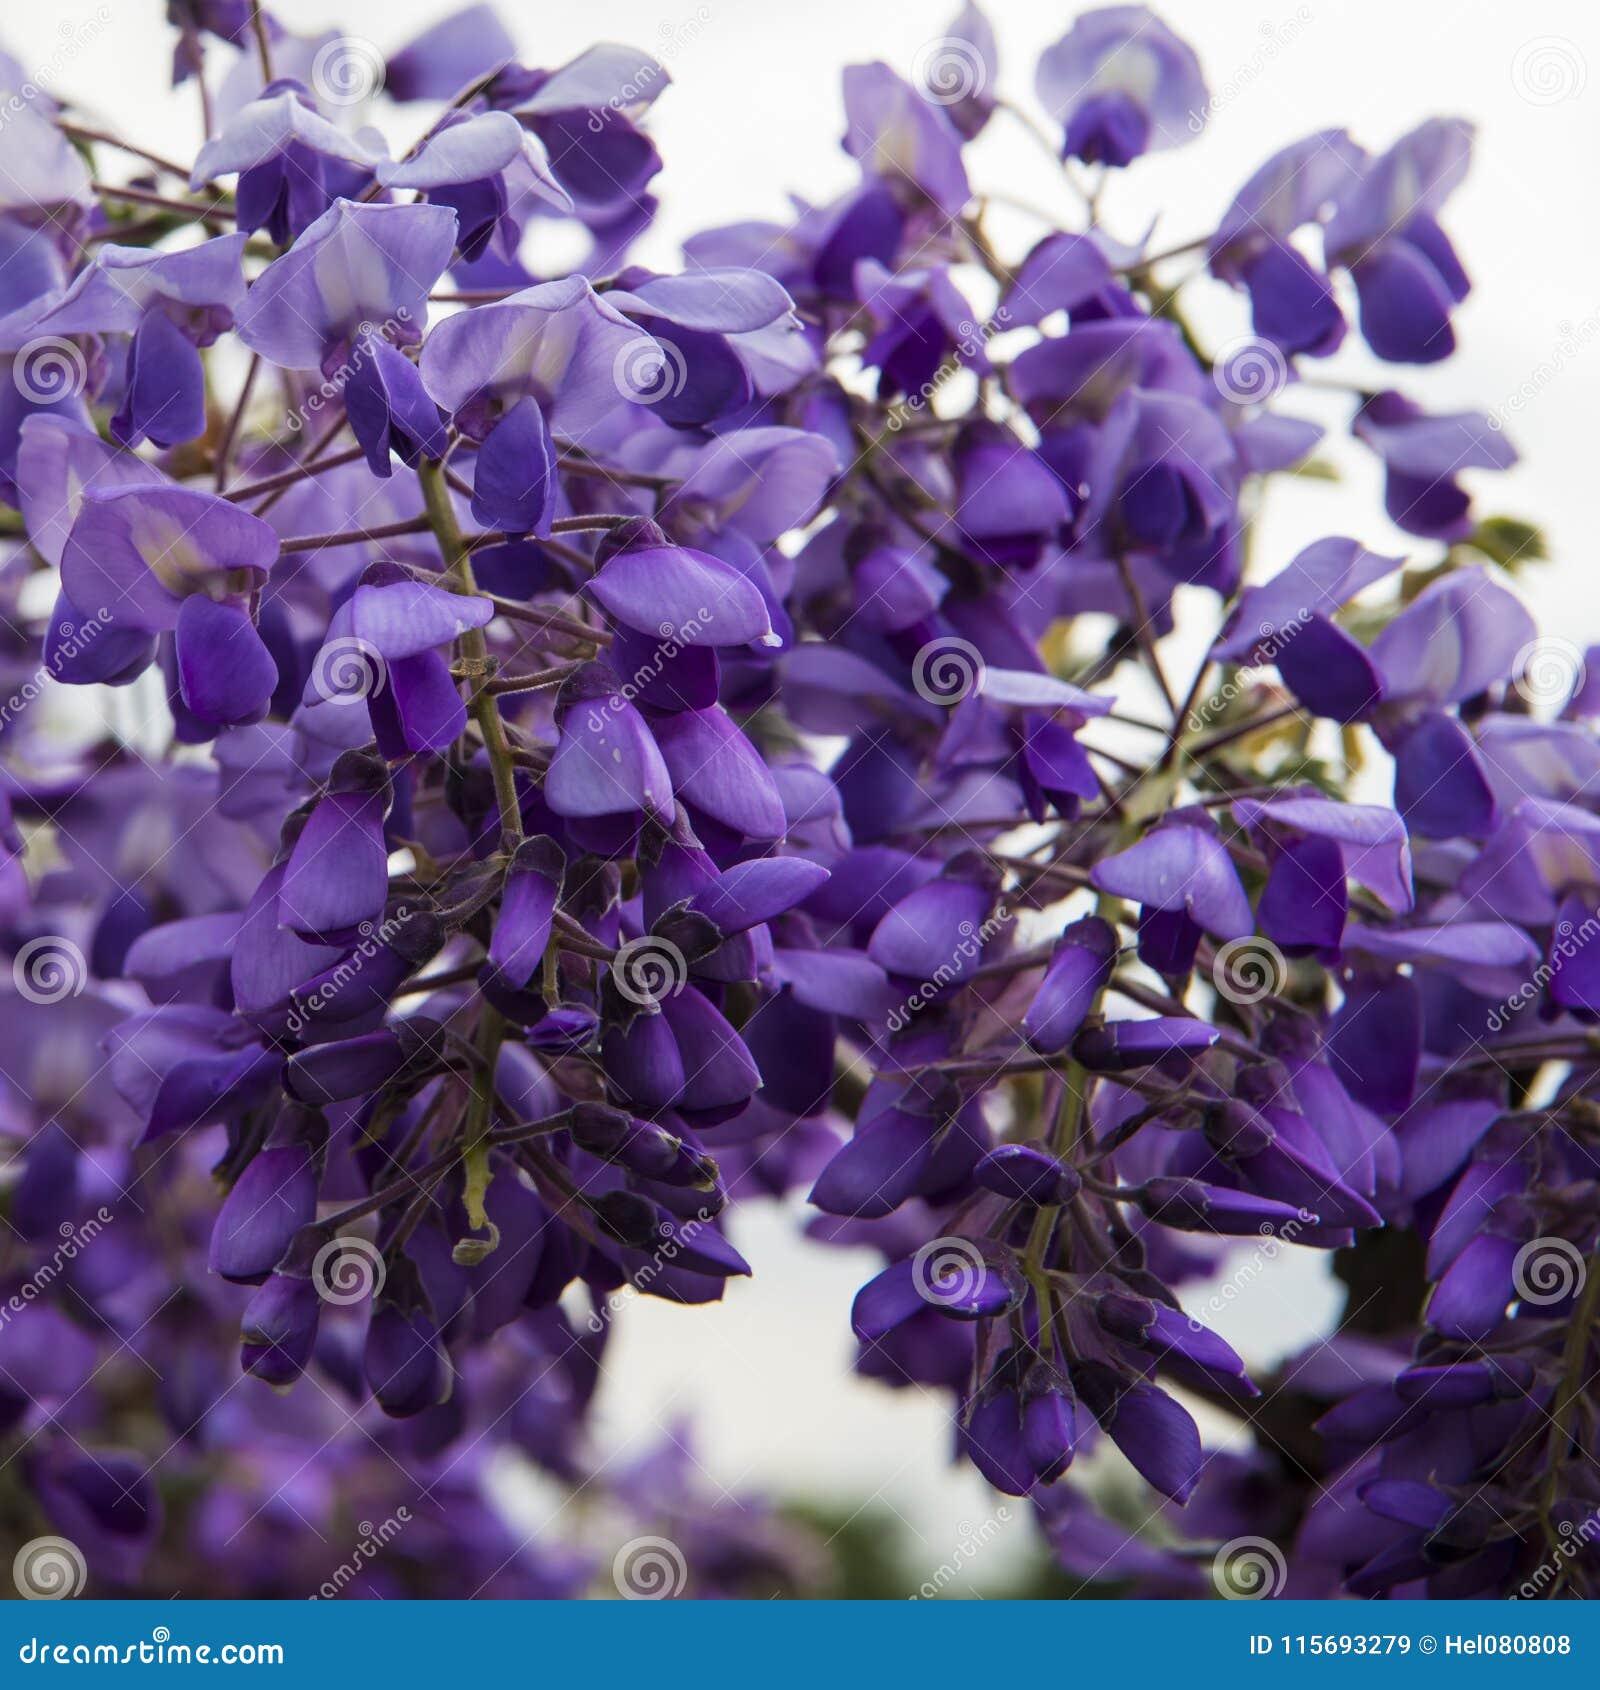 Blossoming Wisteria in spring season in garden